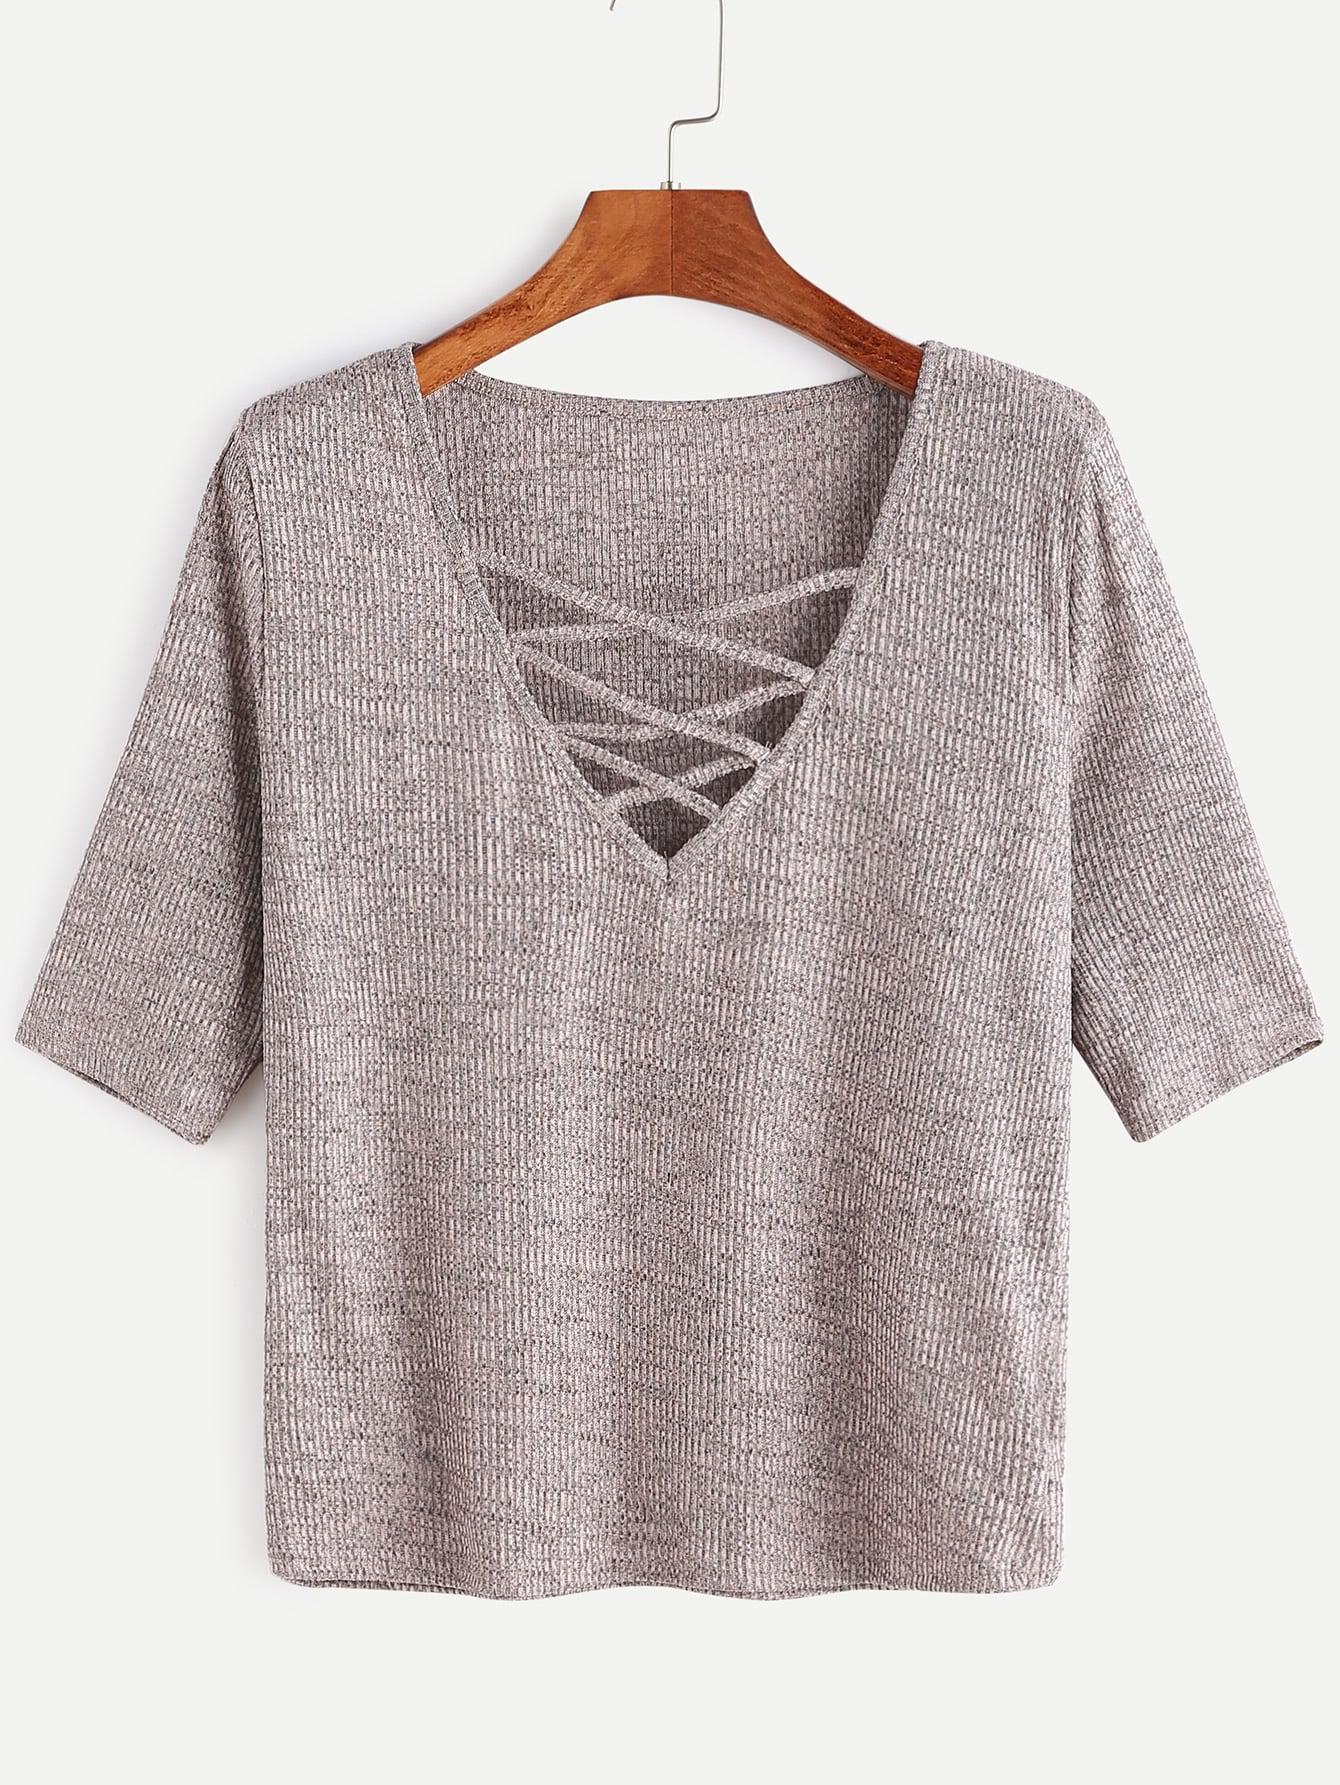 Criss Cross Deep V Neck Ribbed Knit T-shirt RTSH161213001